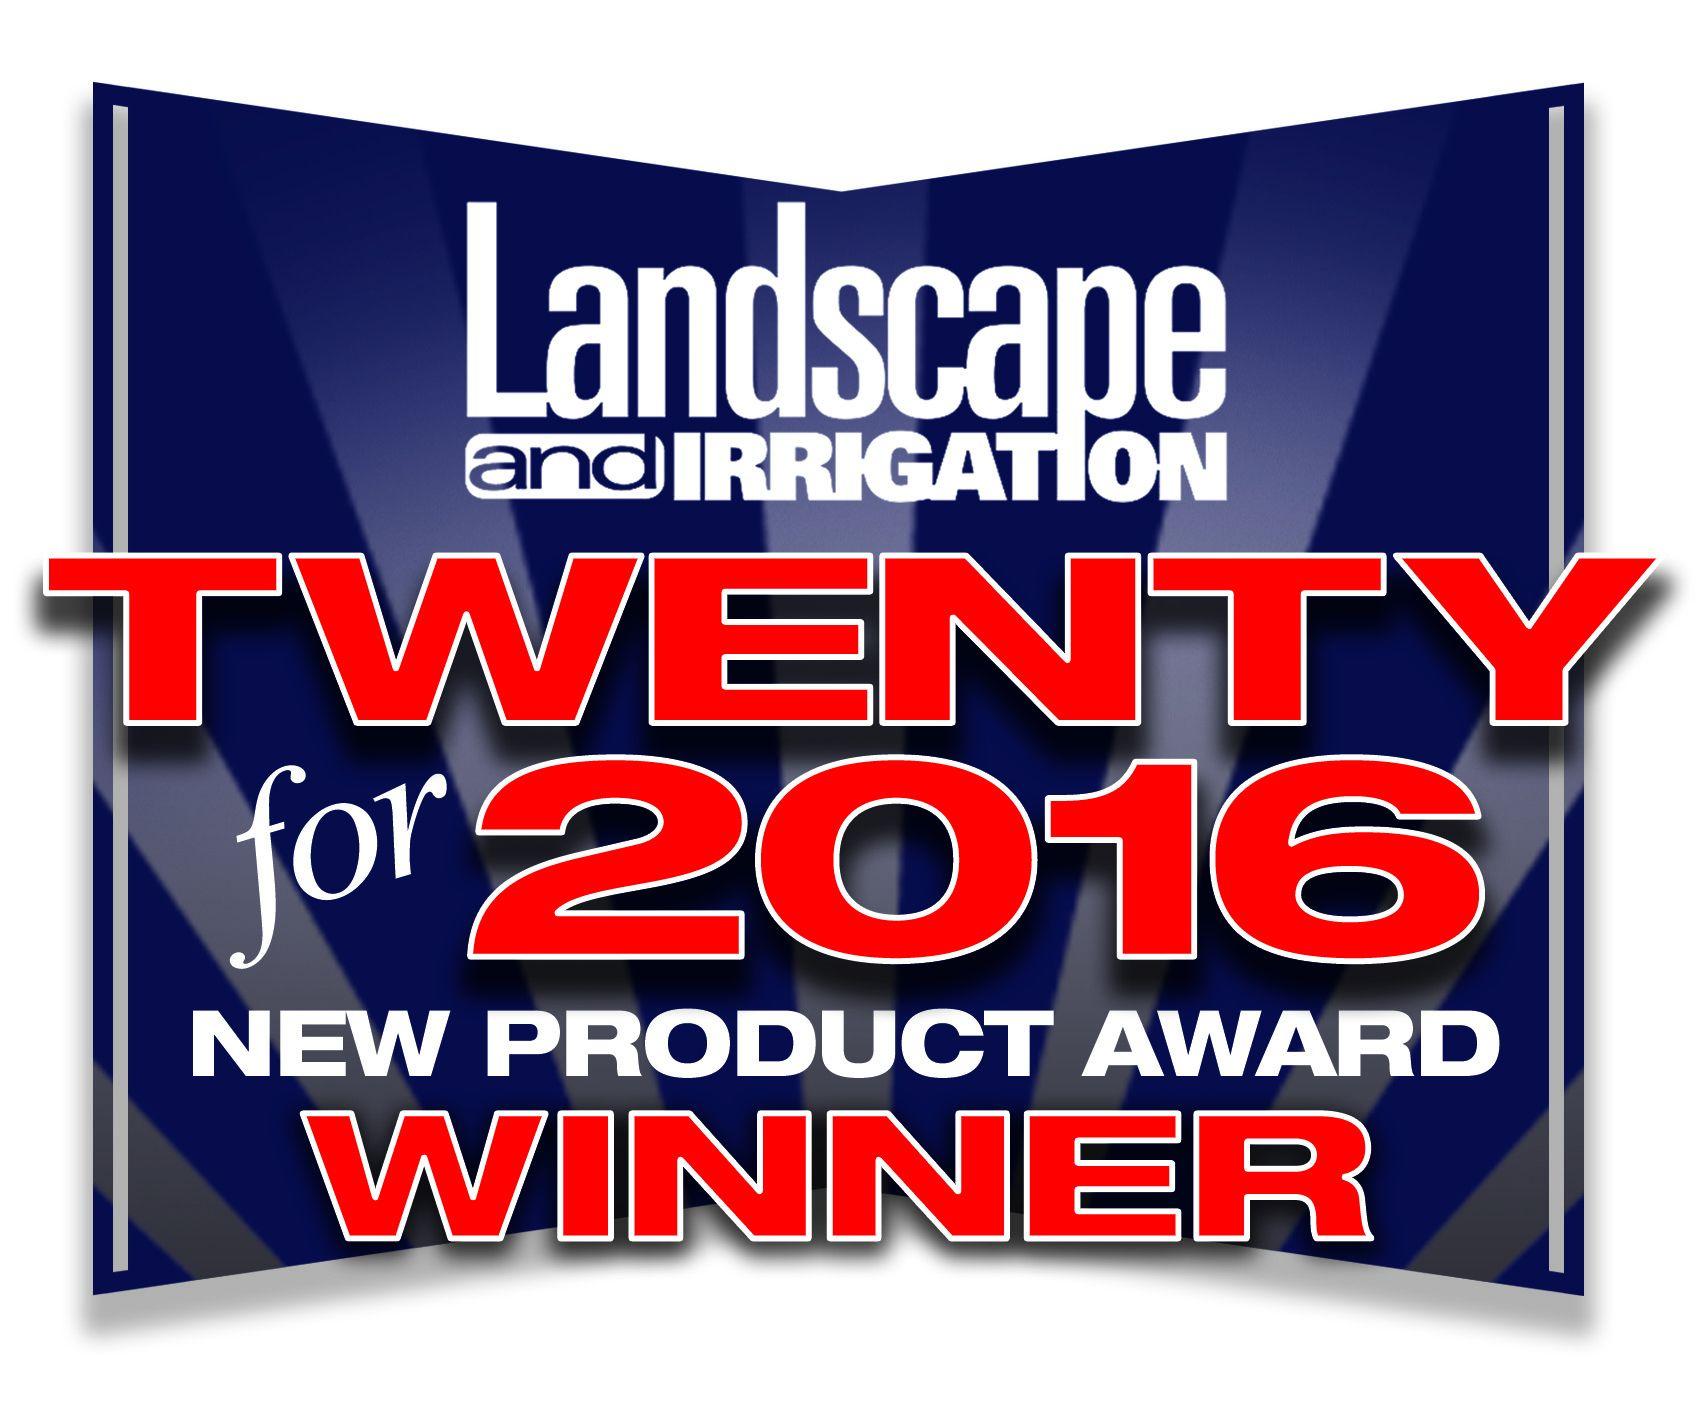 IrriGreen: Irrigation System Technology So Smart It's Genius